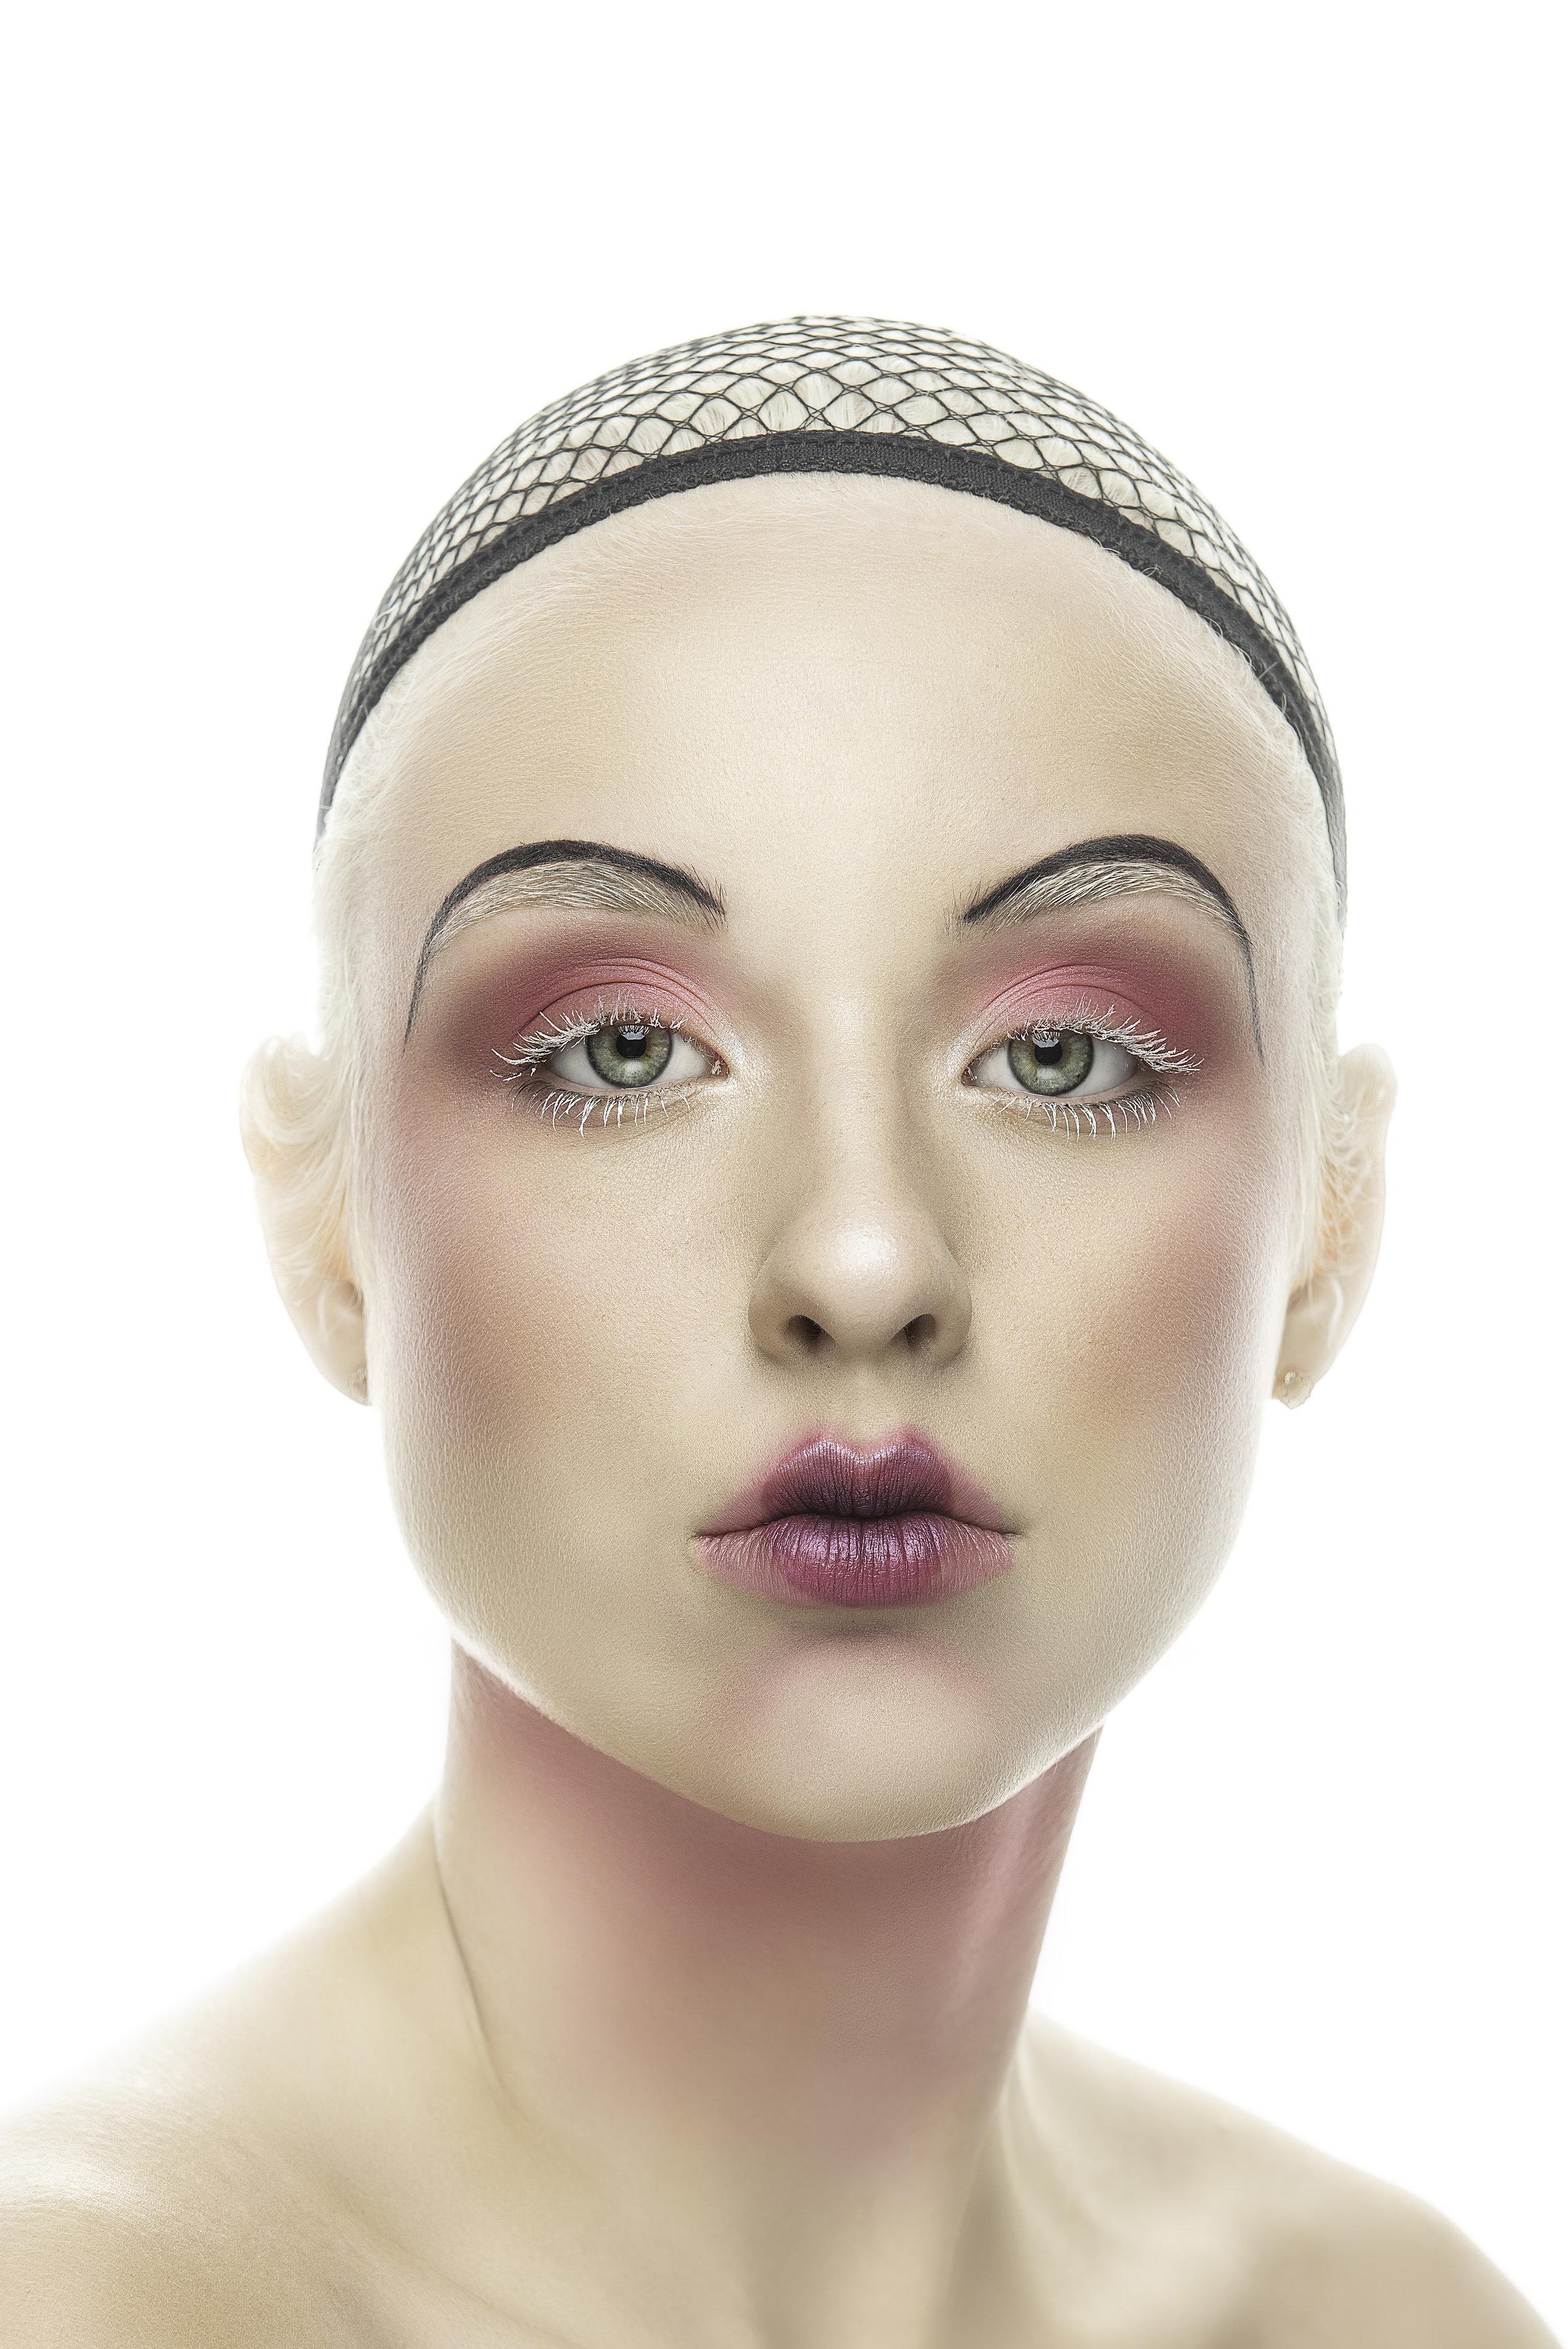 Makeup Artist - Dana Harris